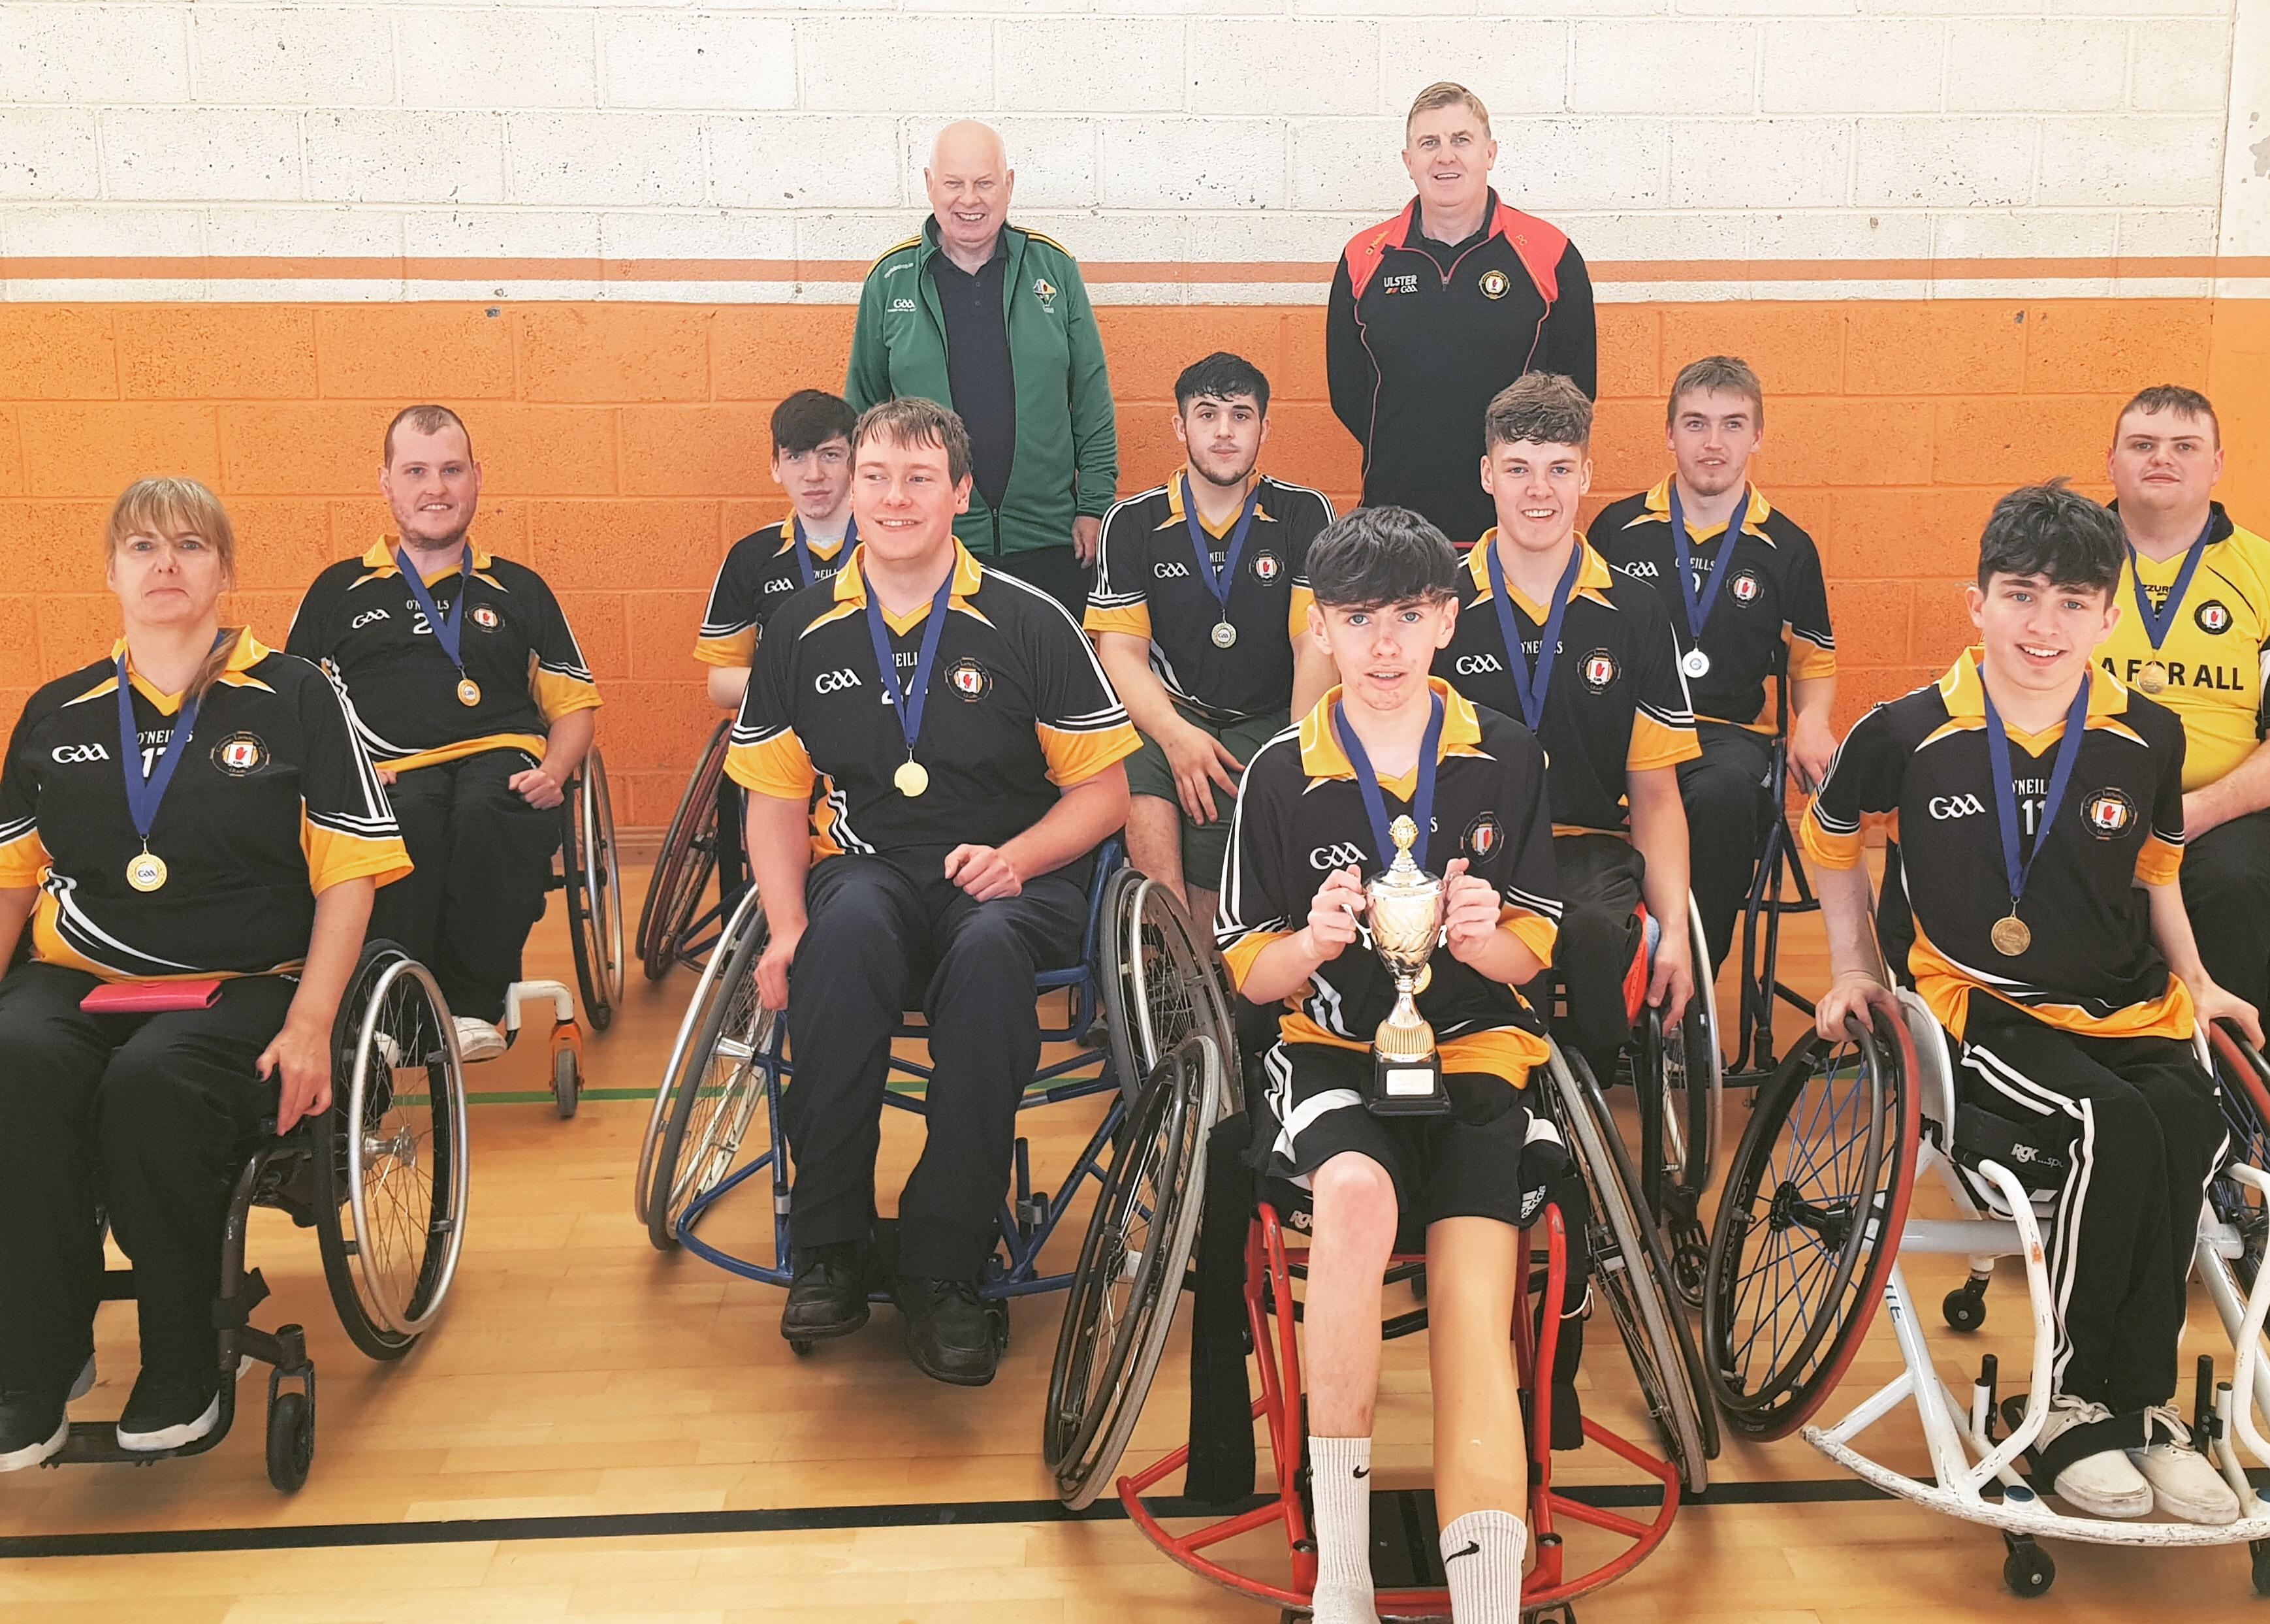 Ulster GAA Wheelchair Hurlers crowned All-Ireland Champions